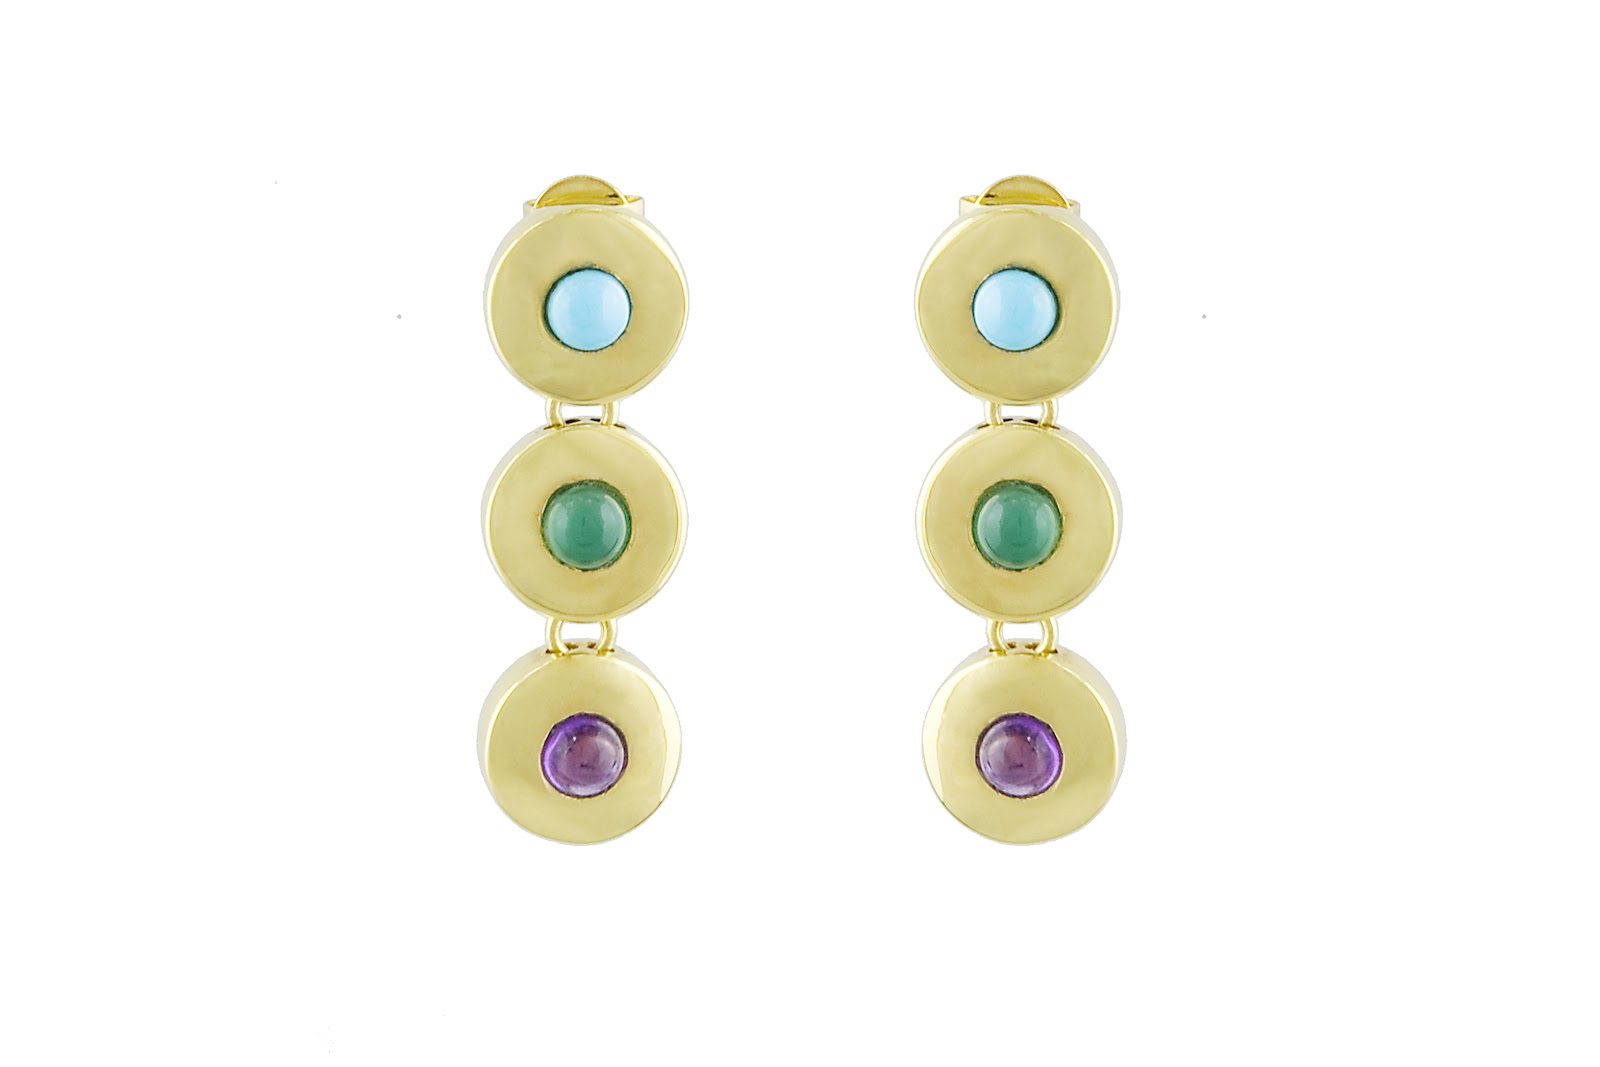 http://1.bp.blogspot.com/-kjrmRIs3-VE/T3IhDsPoa0I/AAAAAAAAAfA/I6BEH5Nndj8/s1600/Cayman+Earrings+2.jpg